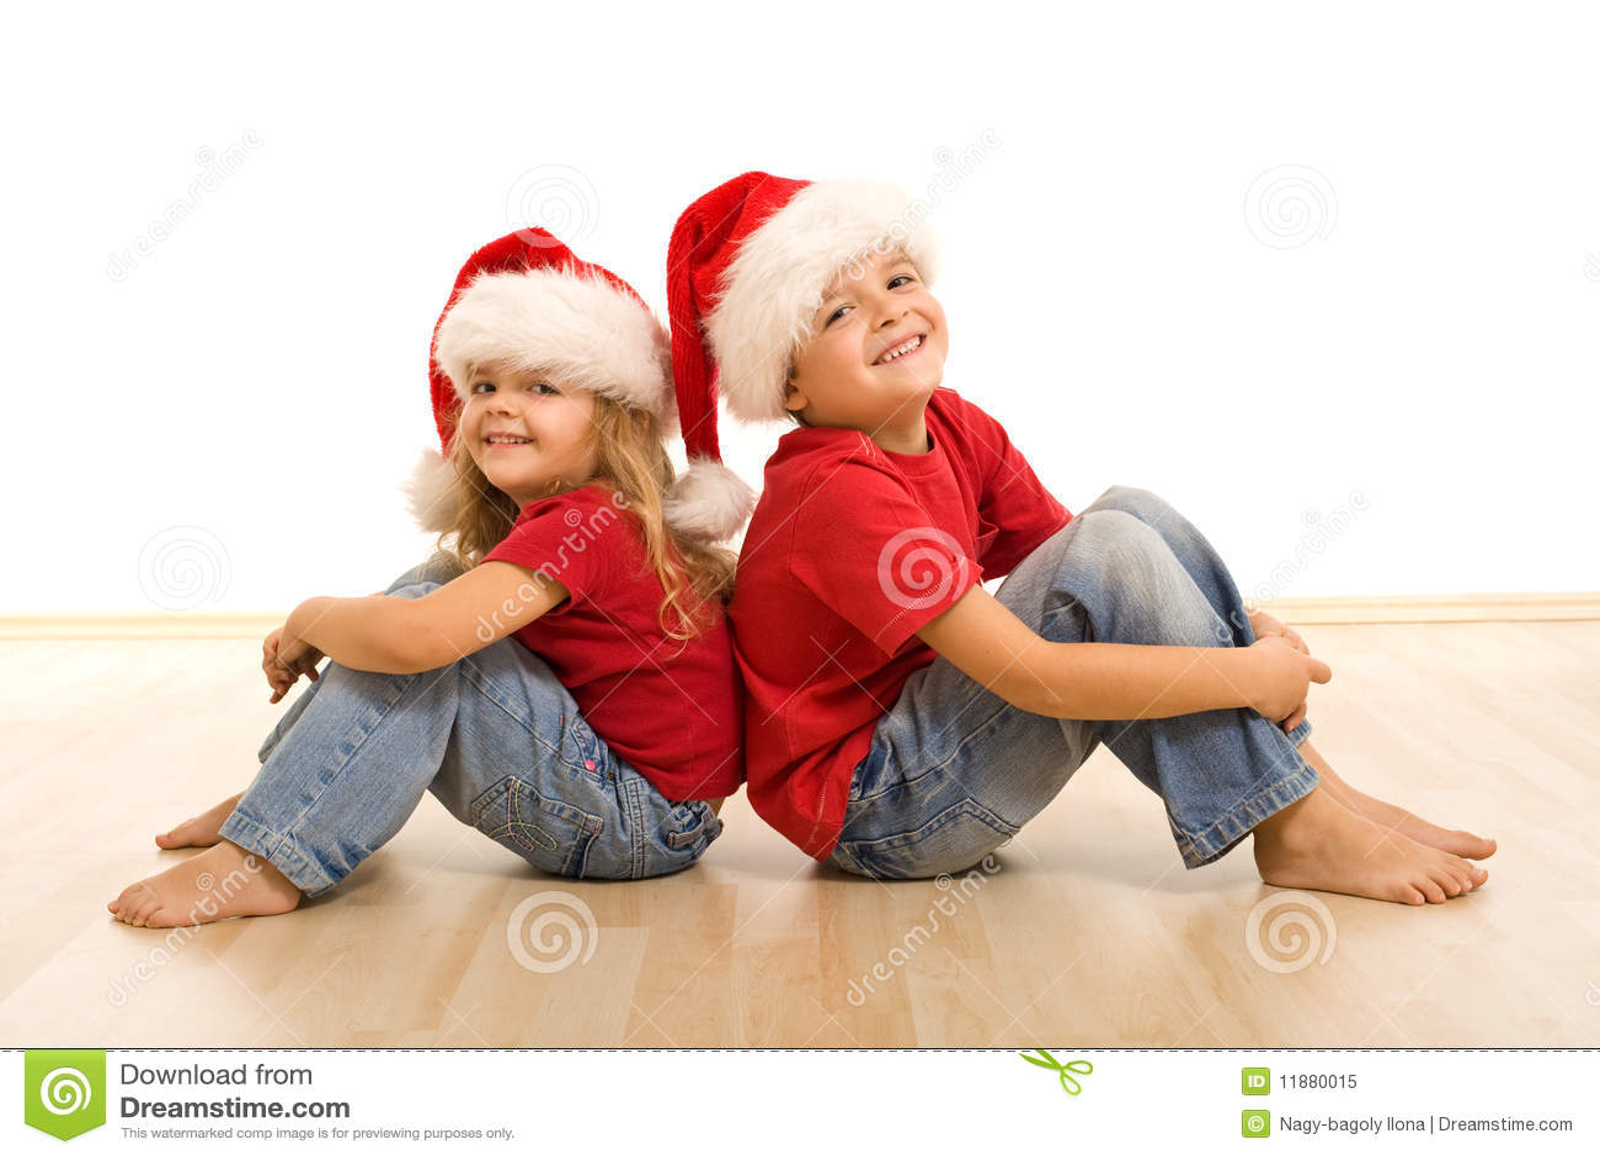 Happy christmas kids sitting on the floor stock image for On the floor on the floor